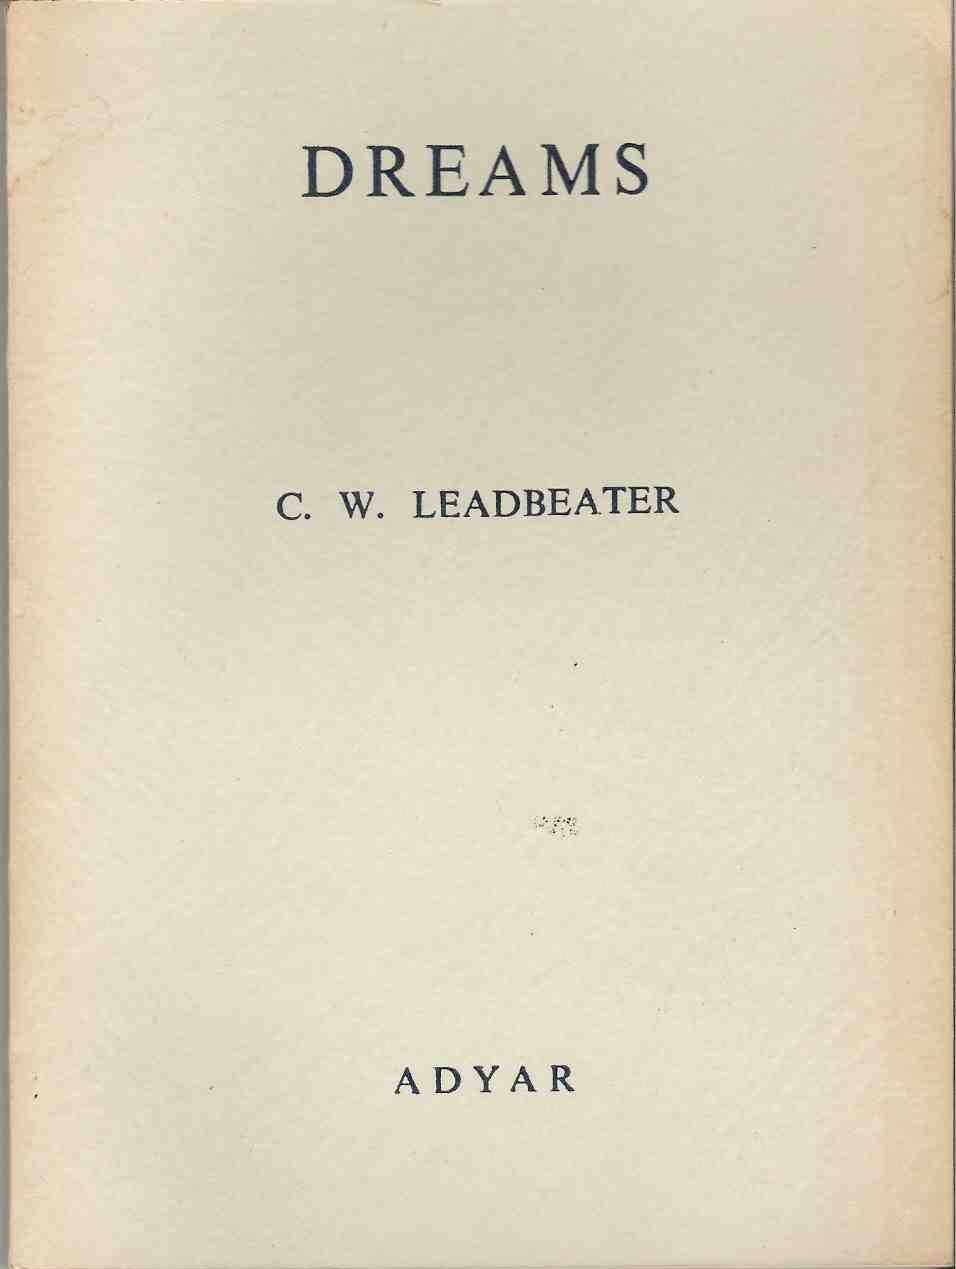 DreamsbyCWLeadbeater.jpg